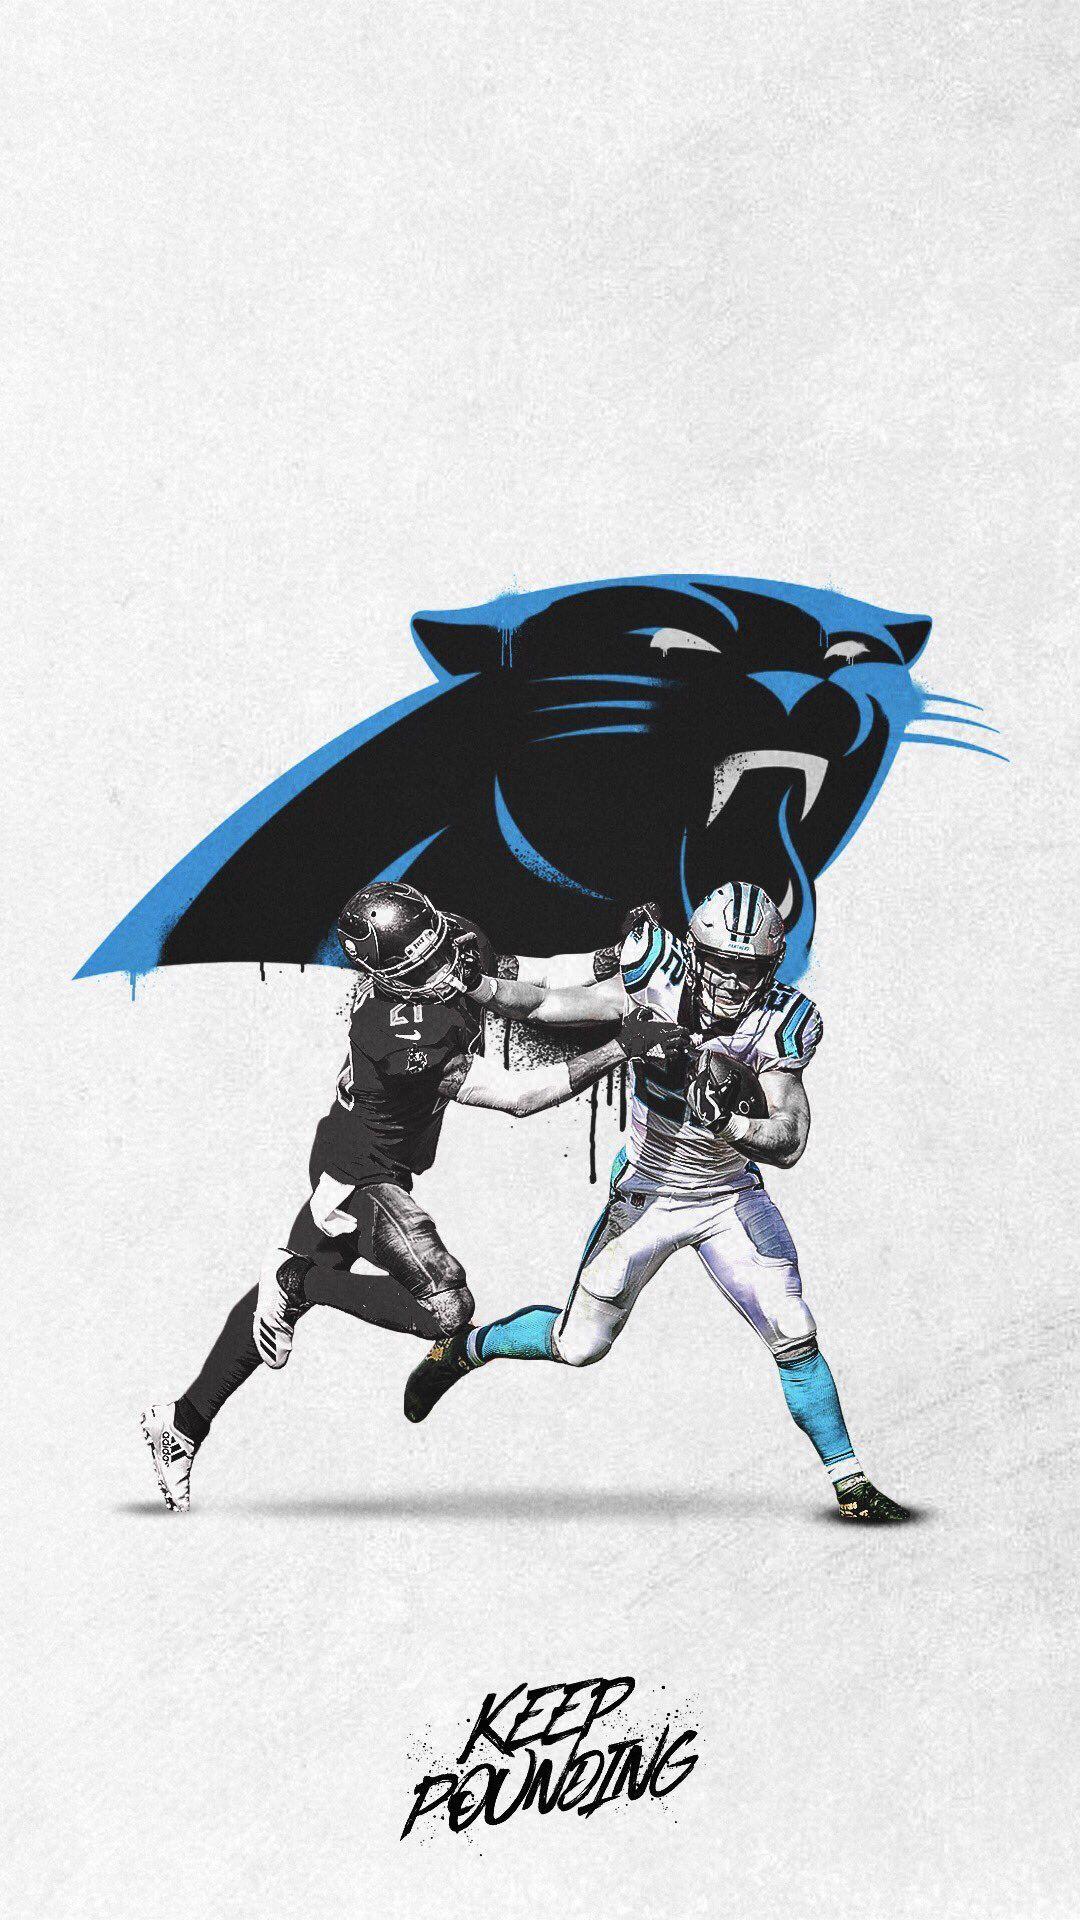 Carolina Panthers Wallpaper Download (With images